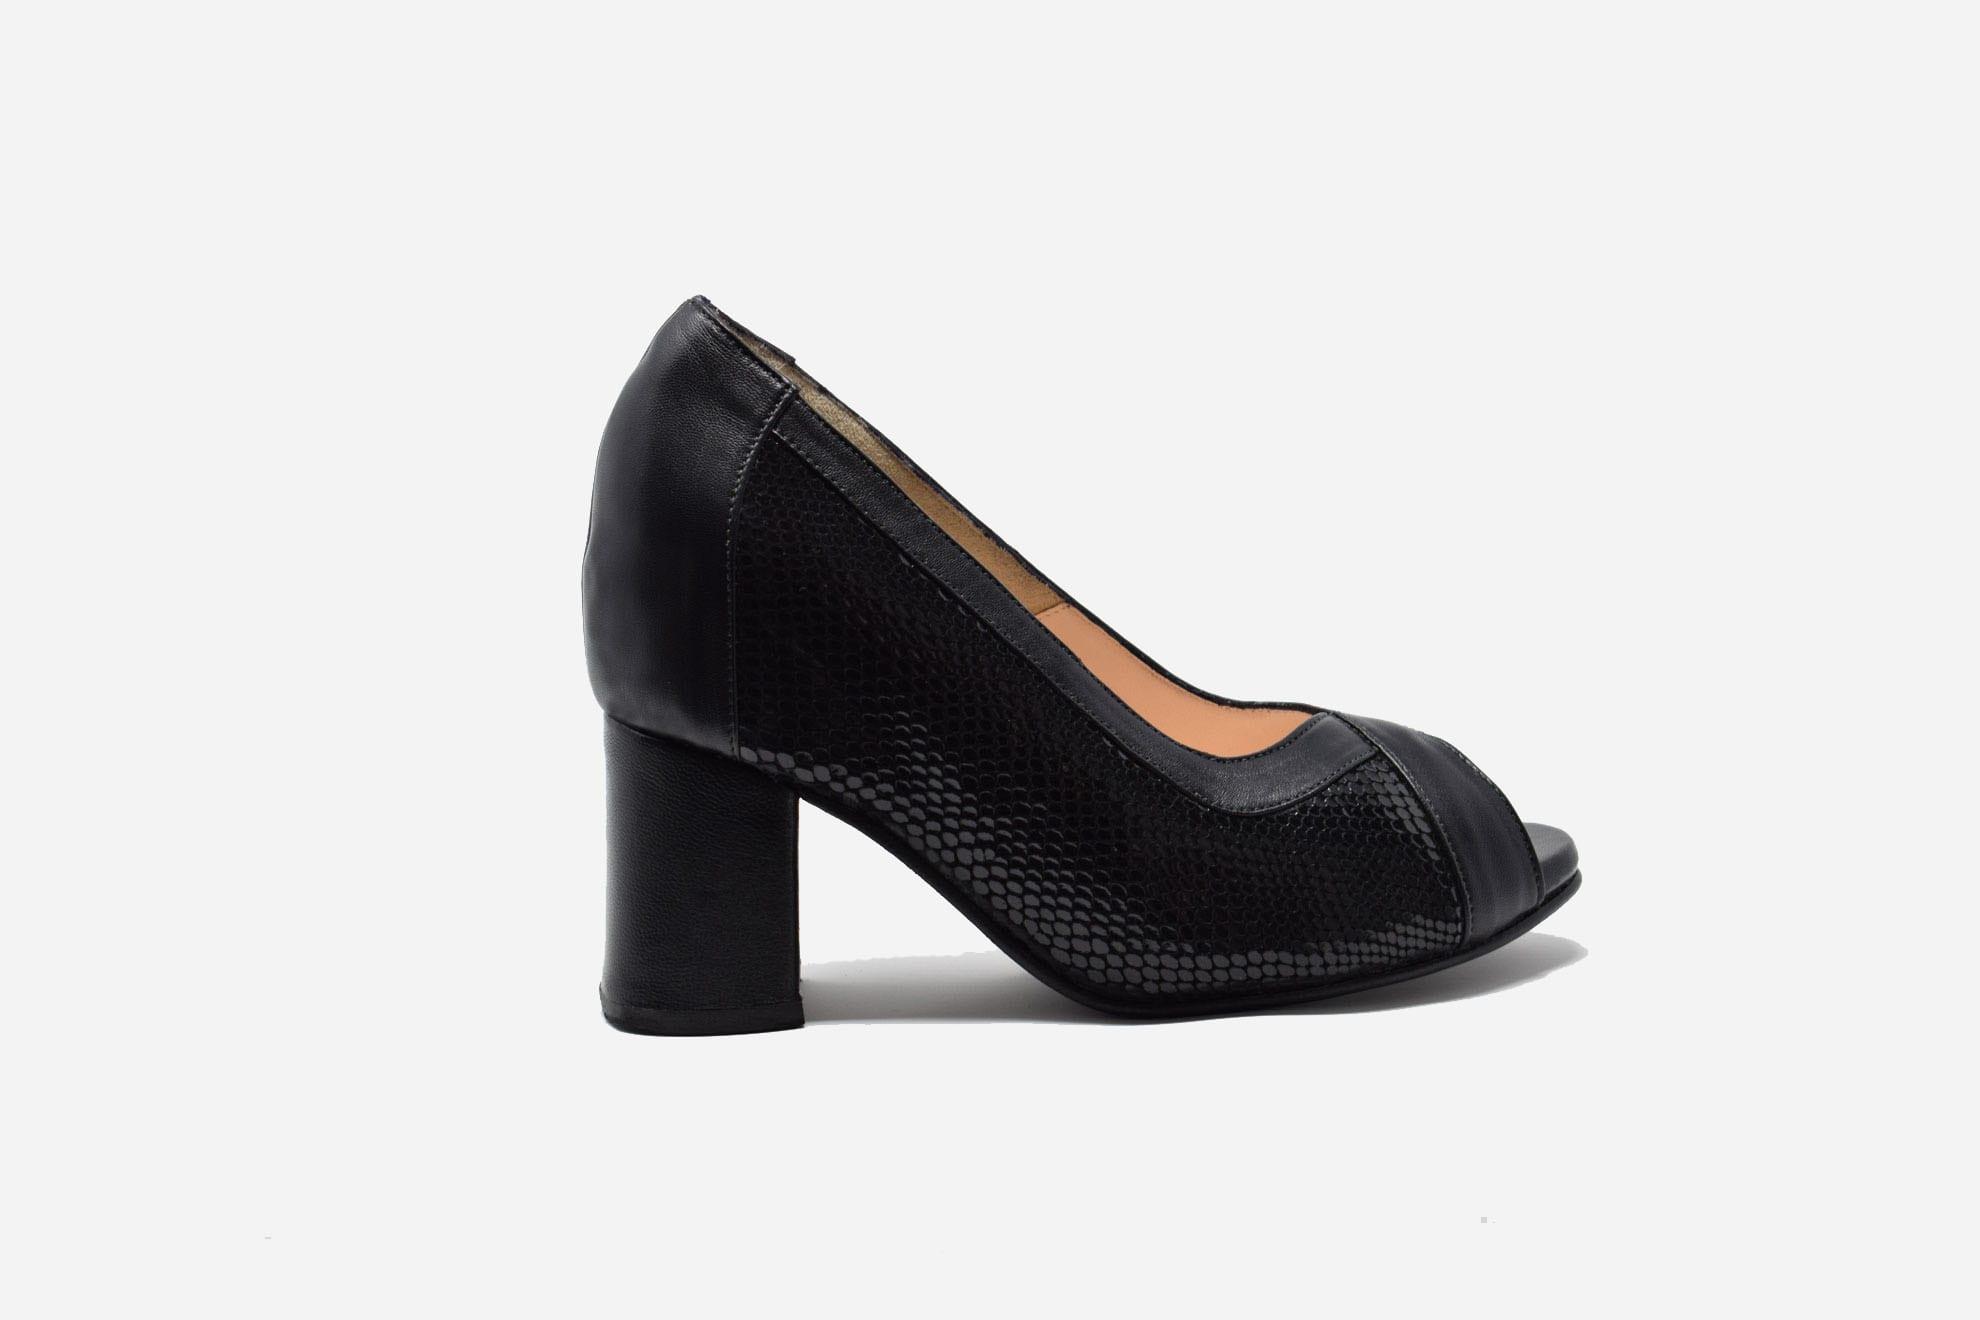 orthopedic court shoes